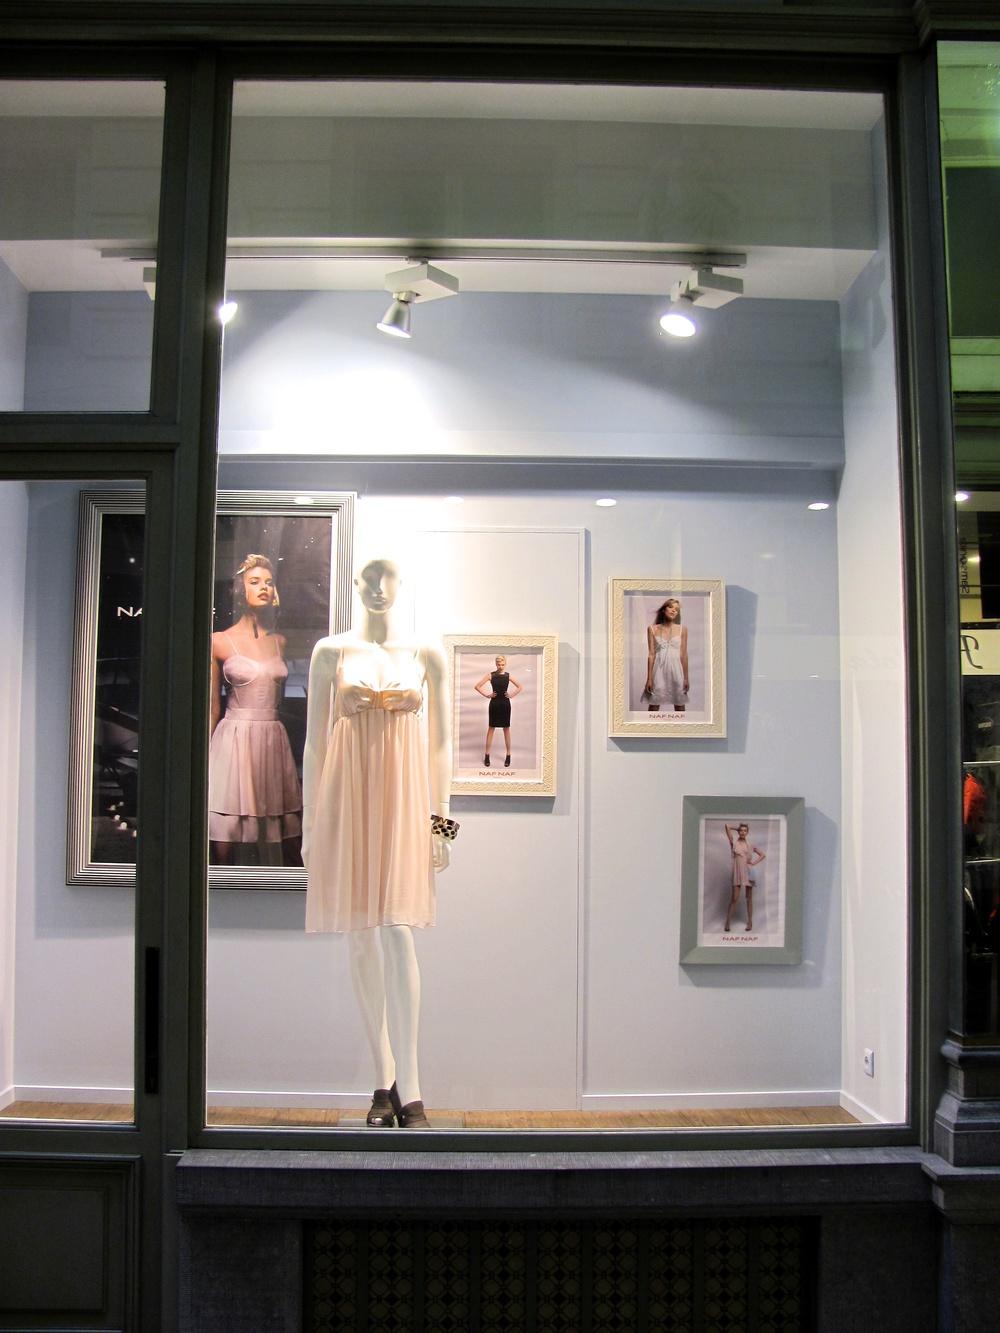 Store front in the Passage du Neuhaus, off Rue Neuve, Brussels, Belgium, VHS 2010